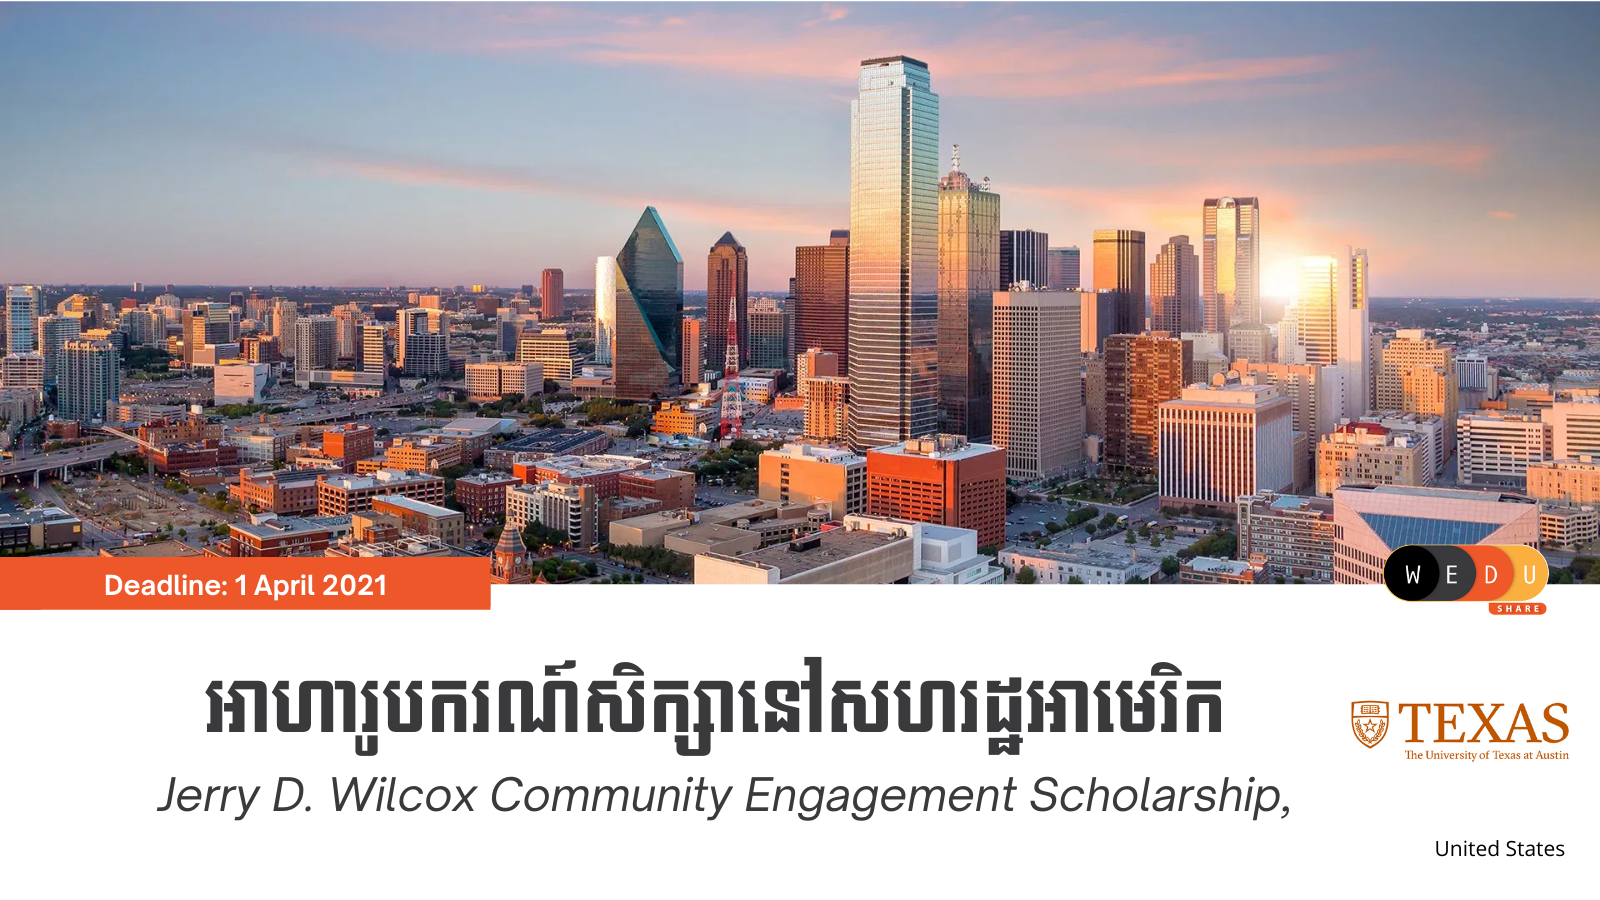 Jerry D. Wilcox Community Engagement Scholarship, 2021